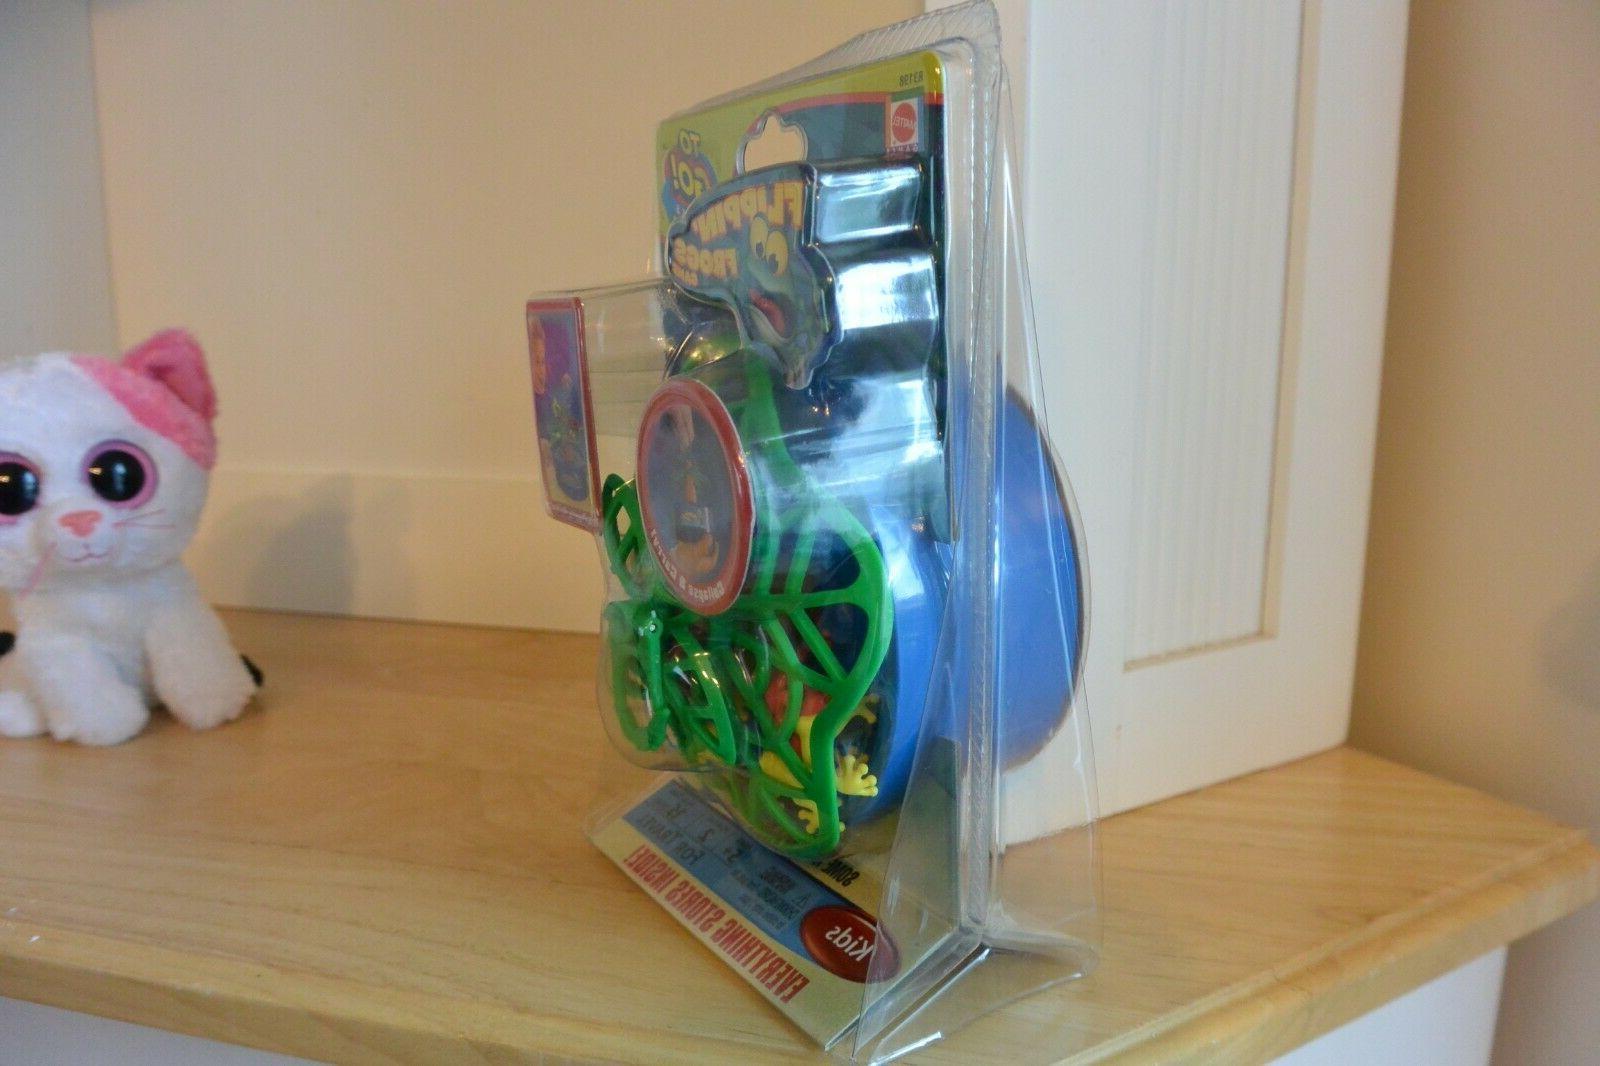 Mattel Frogs To Go Mini Brand New